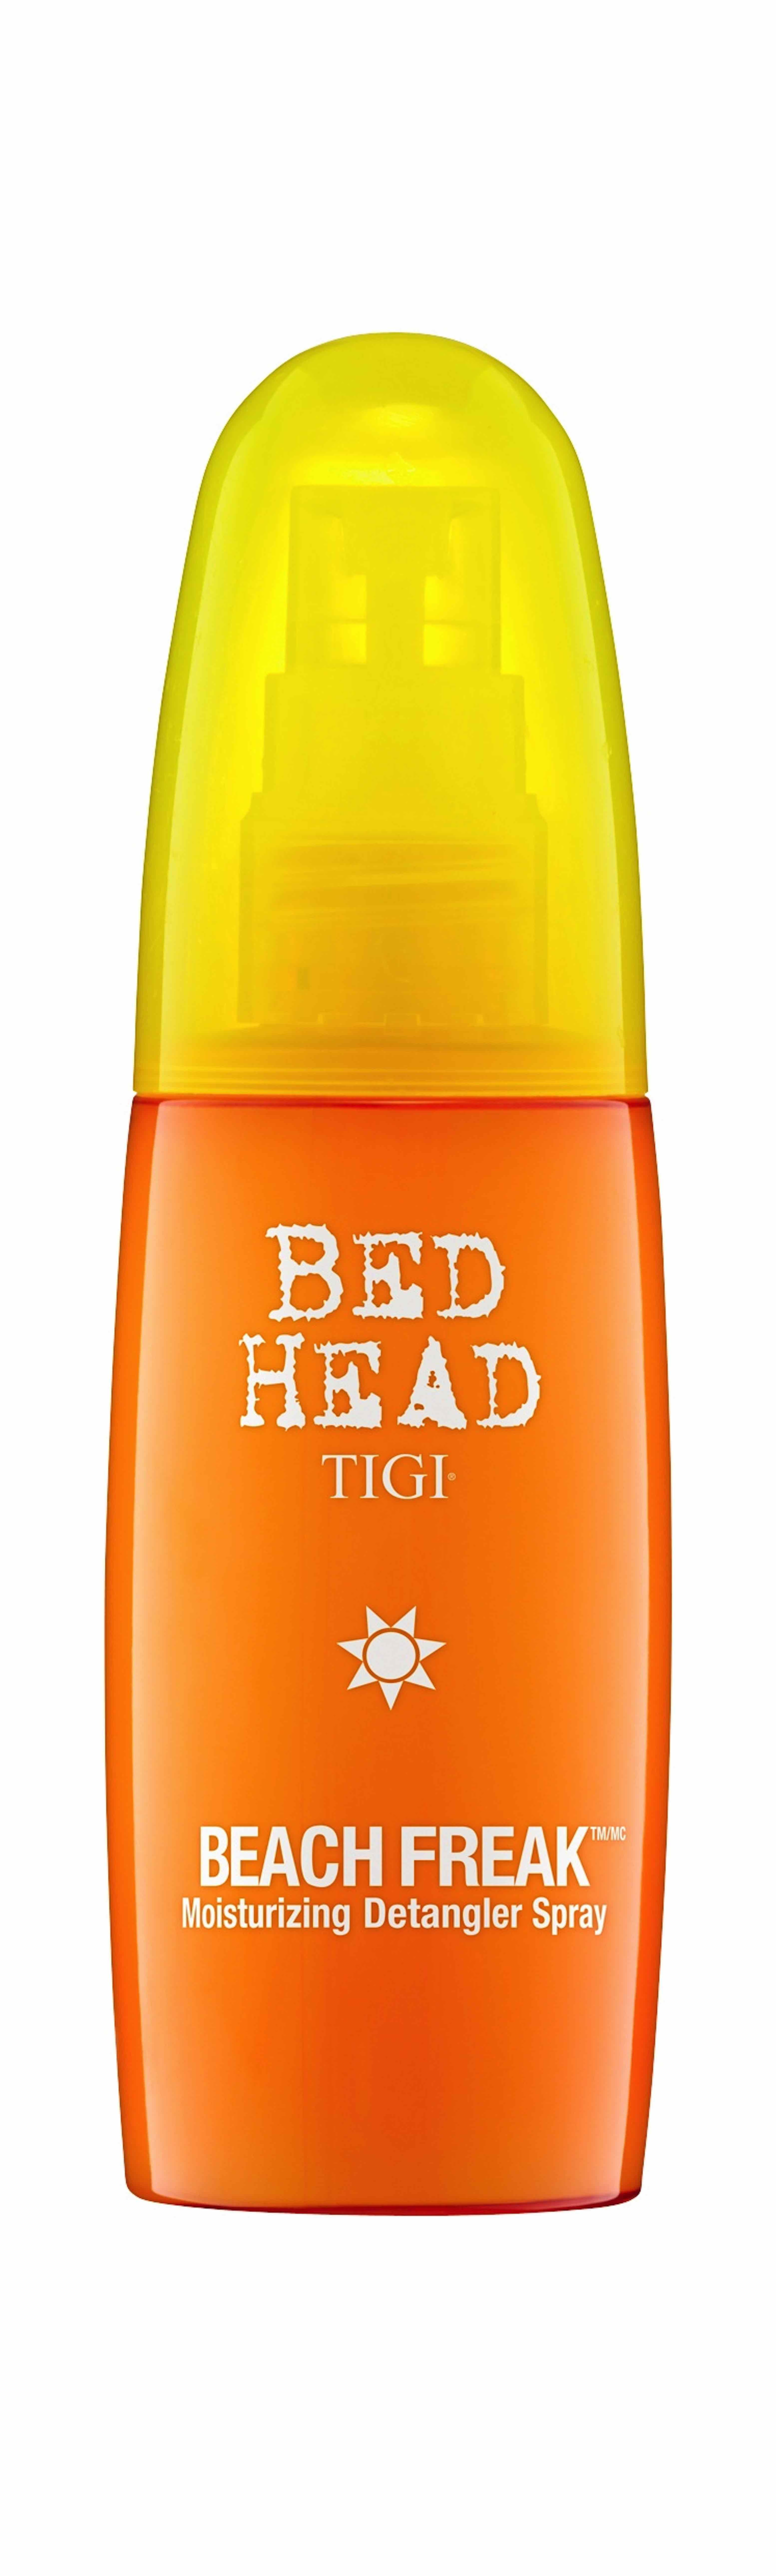 3- TIGI BED HEAD BEACH FREAK SPRAY 100ML